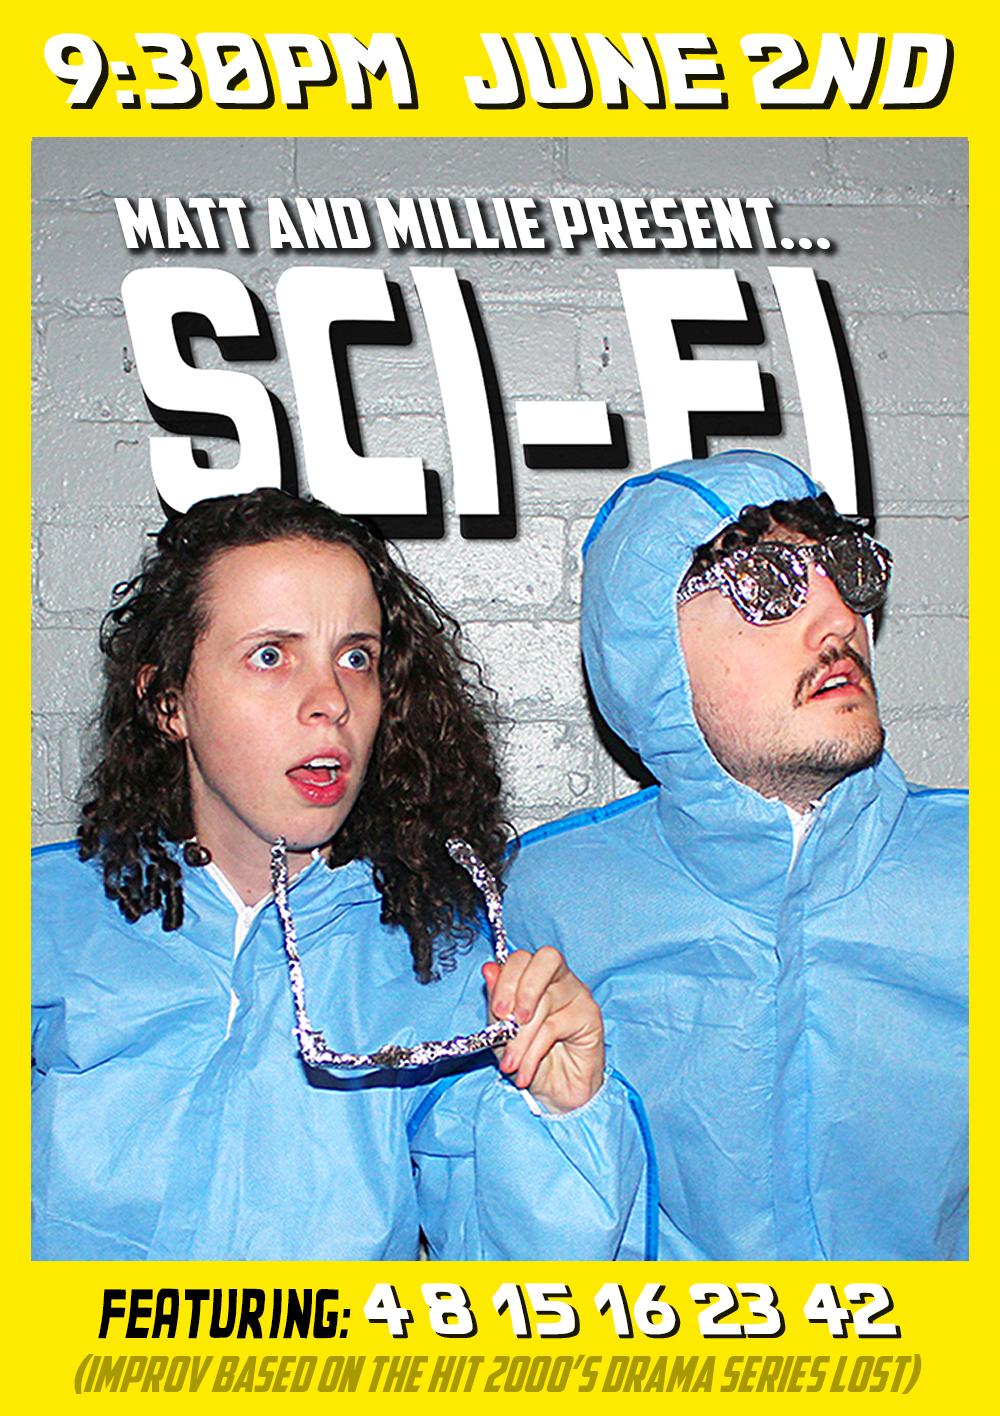 'Matt and Millie Present...'    | Promotional poster